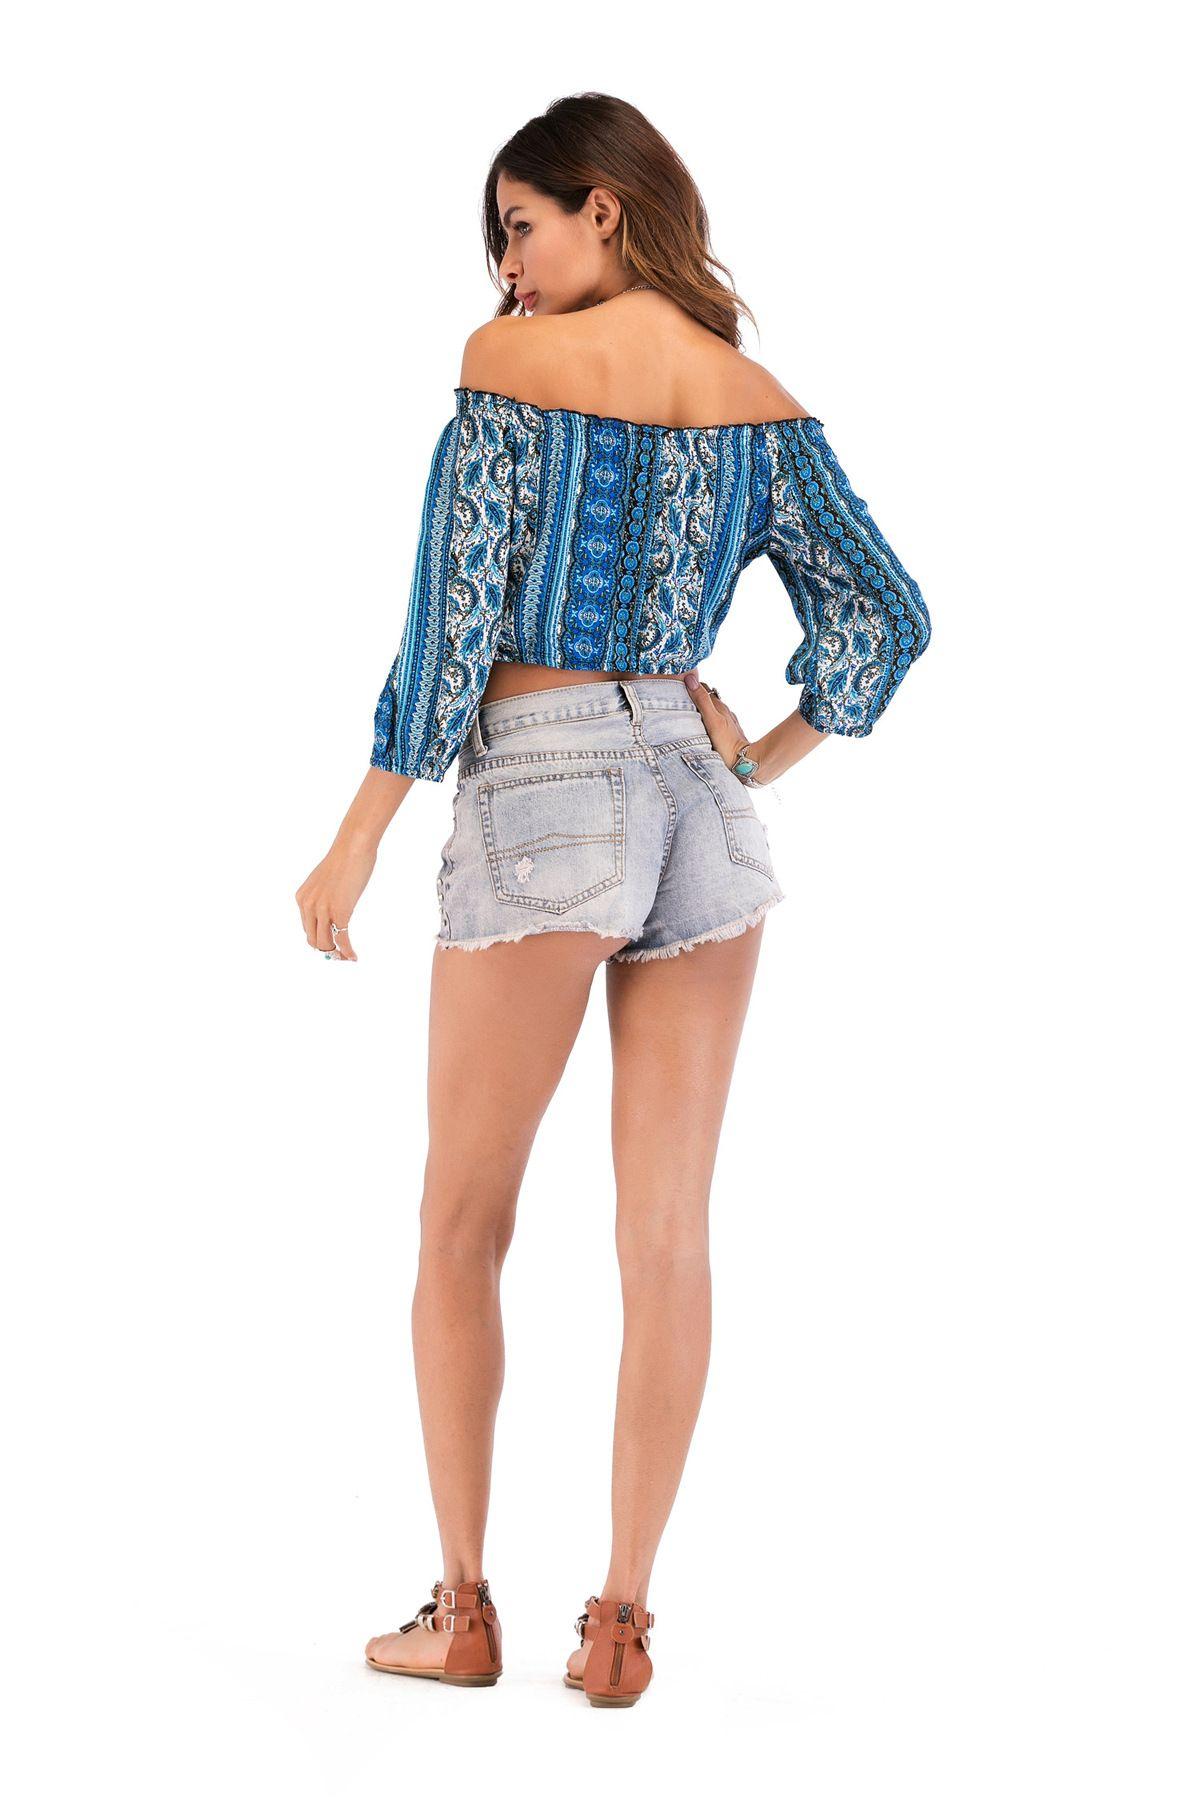 Damen Sommer Off Schulter 3 / 4sleeve Sexy Druck Chiffon Hemd Bluse Crop Top Bohemia Druck Top Bluse L-2XL